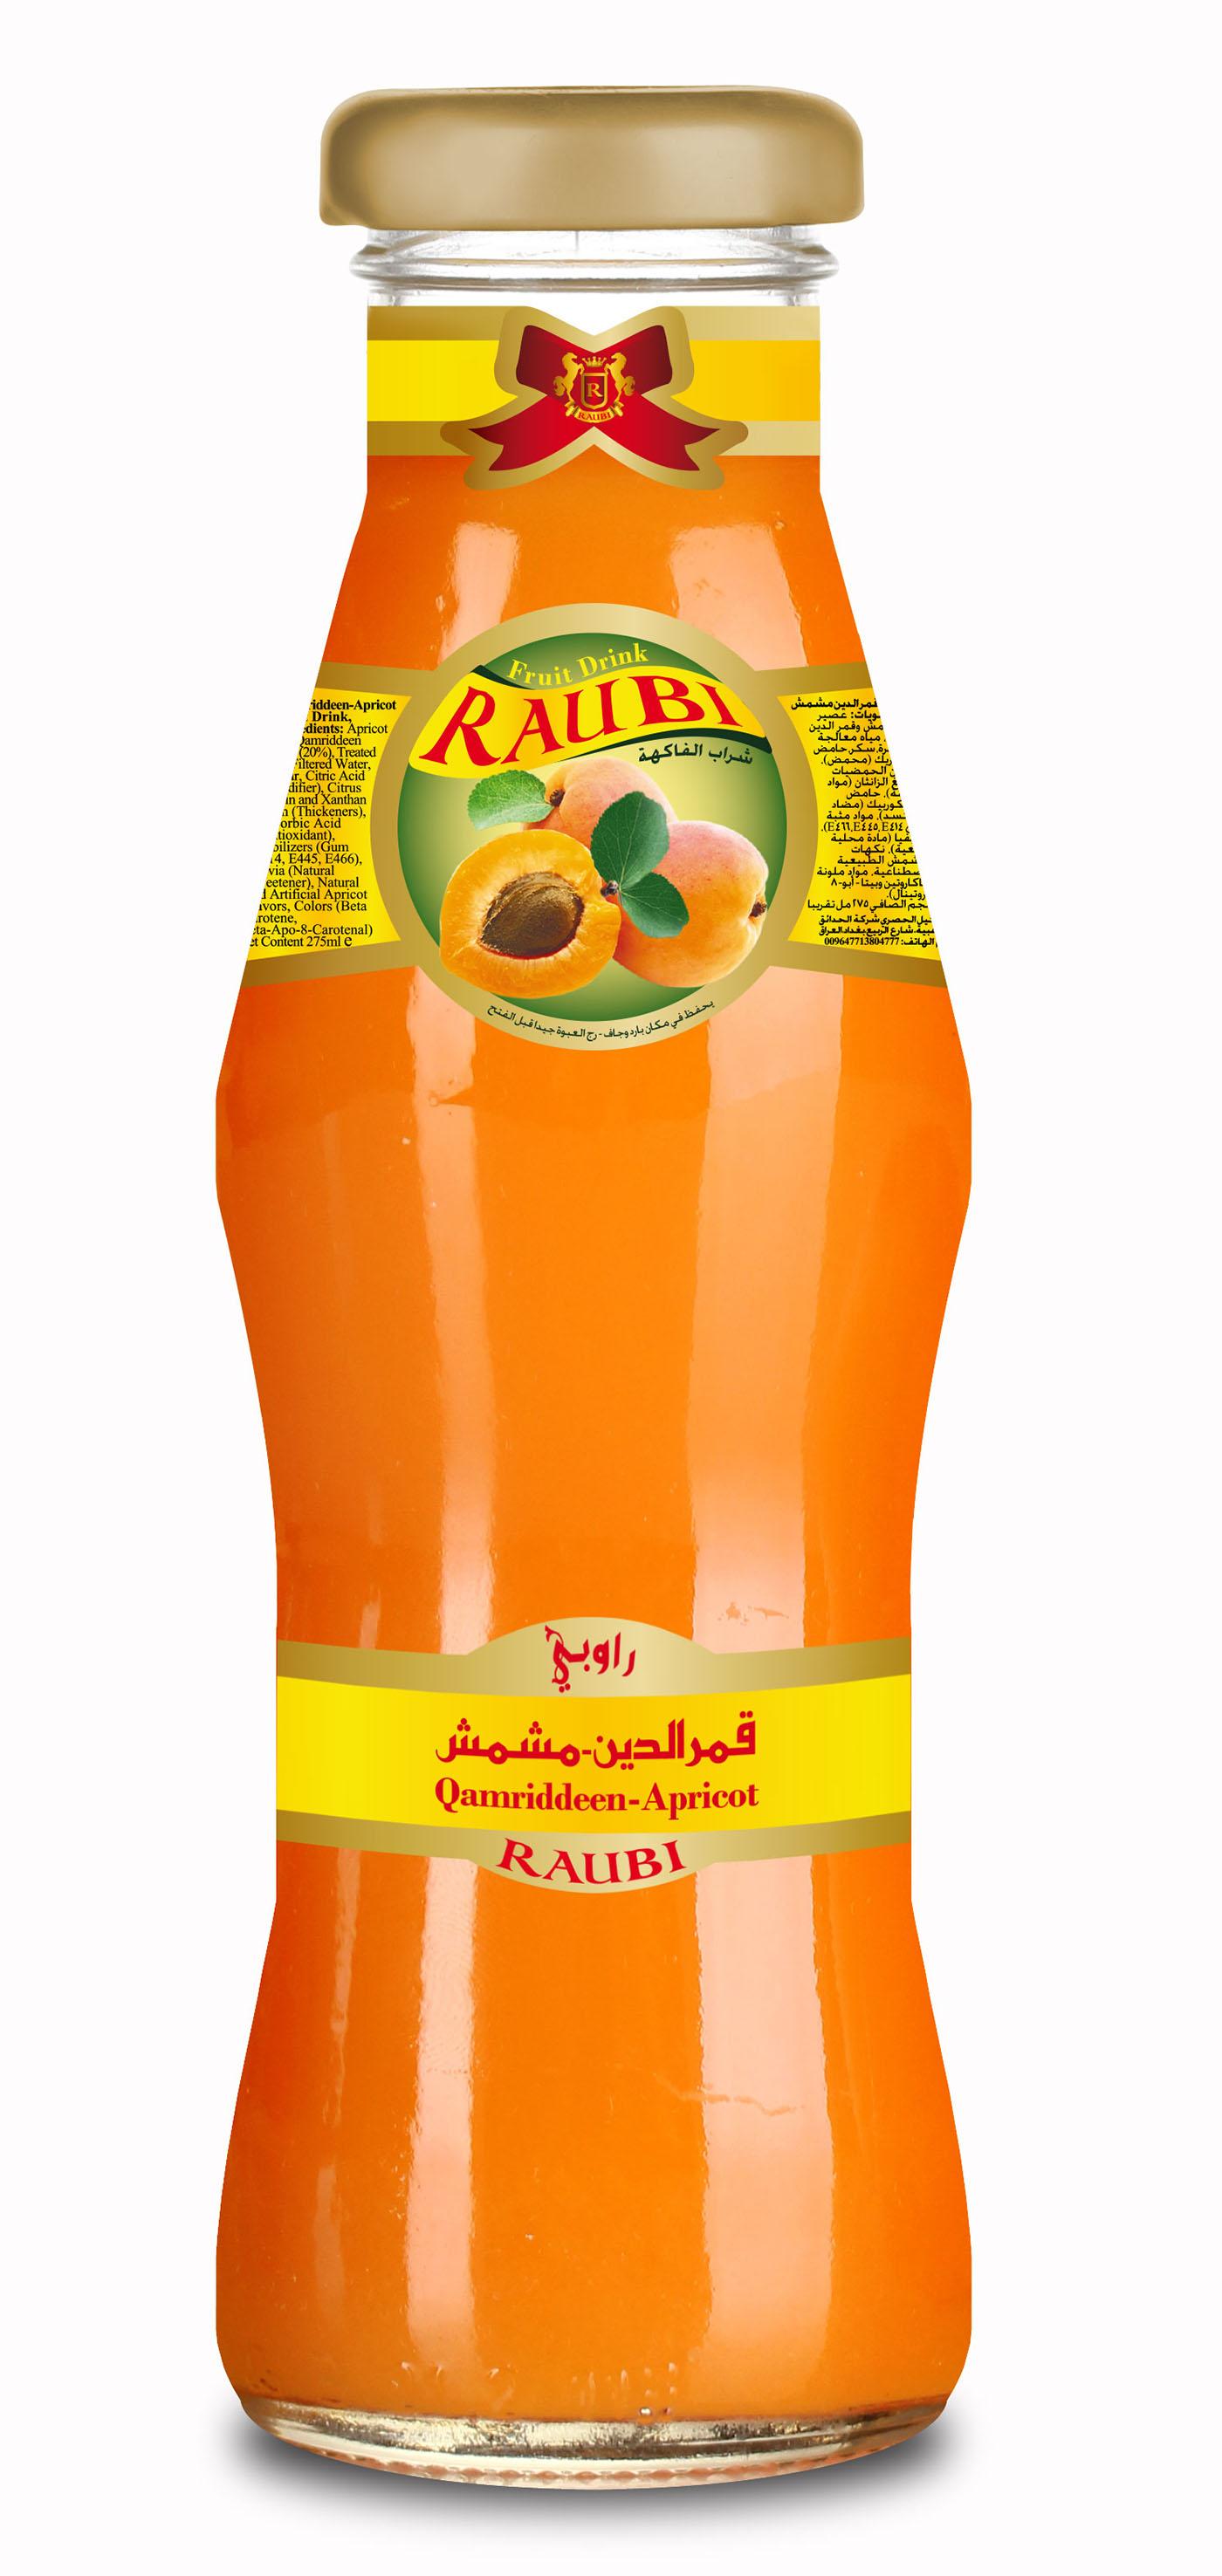 Raubi Fruit Drink - 275ml on Behance